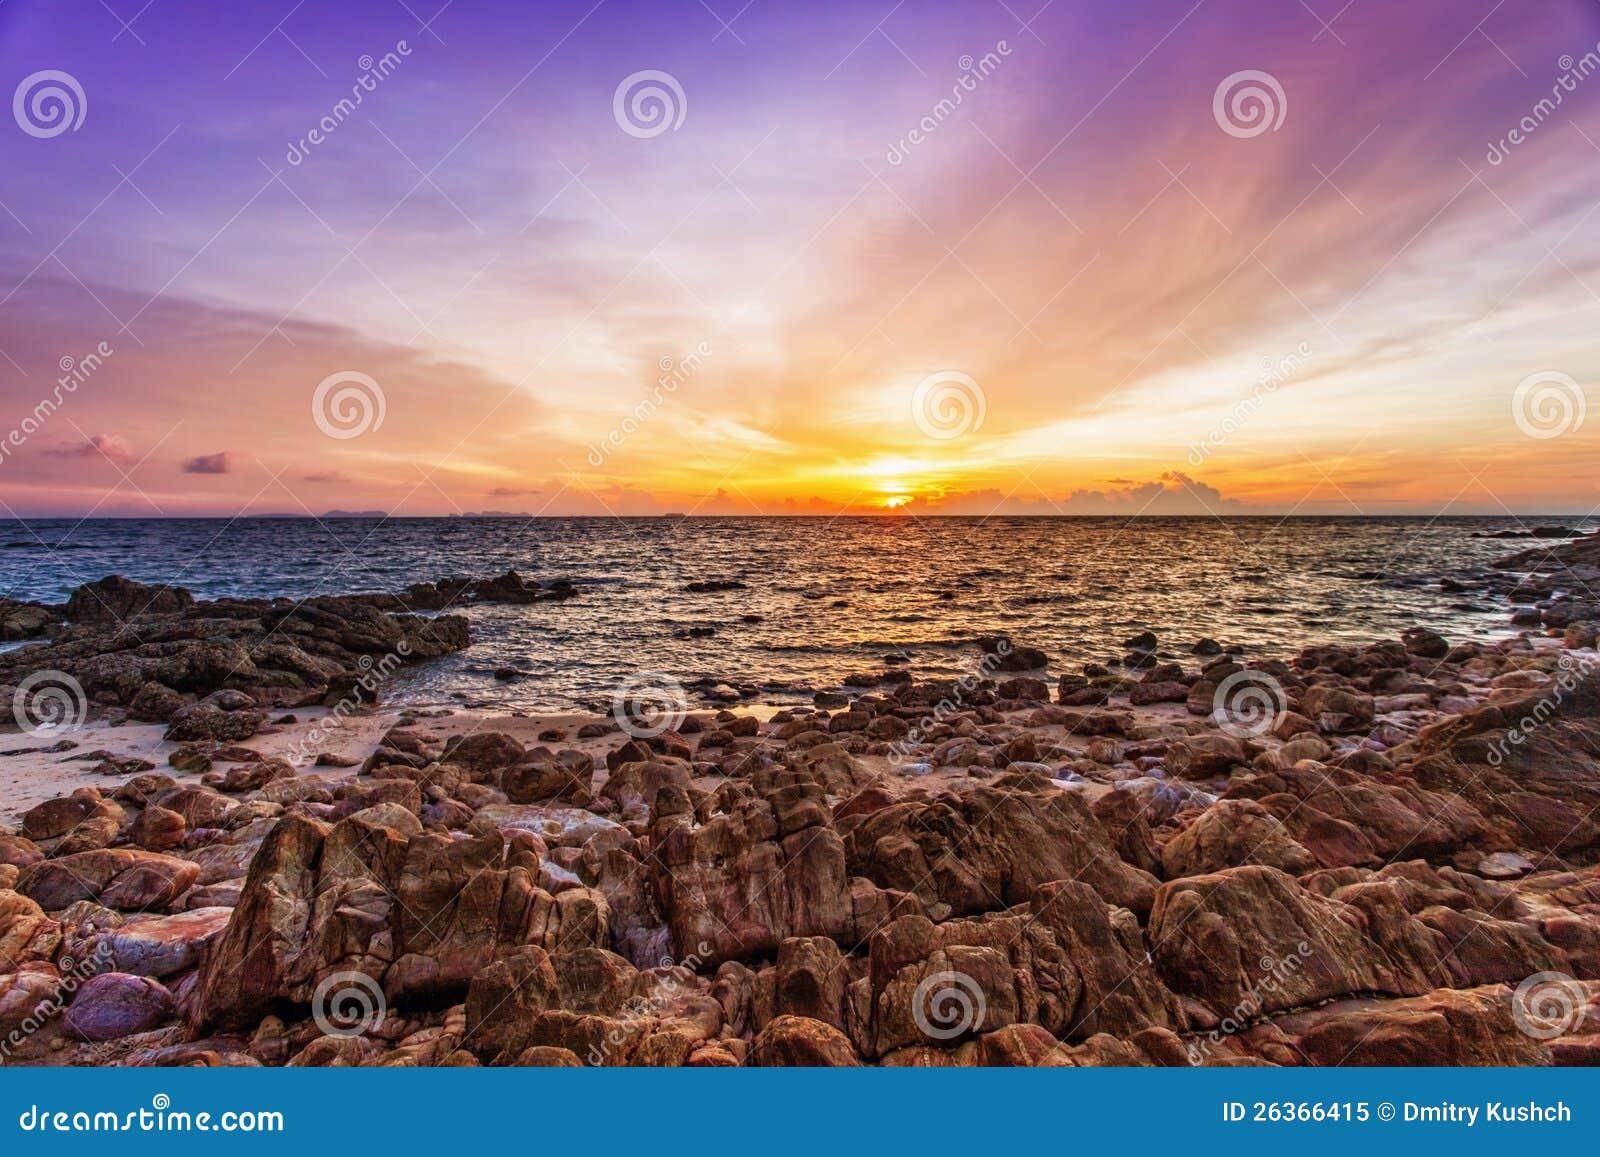 Tropischer Strand am Sonnenuntergang.